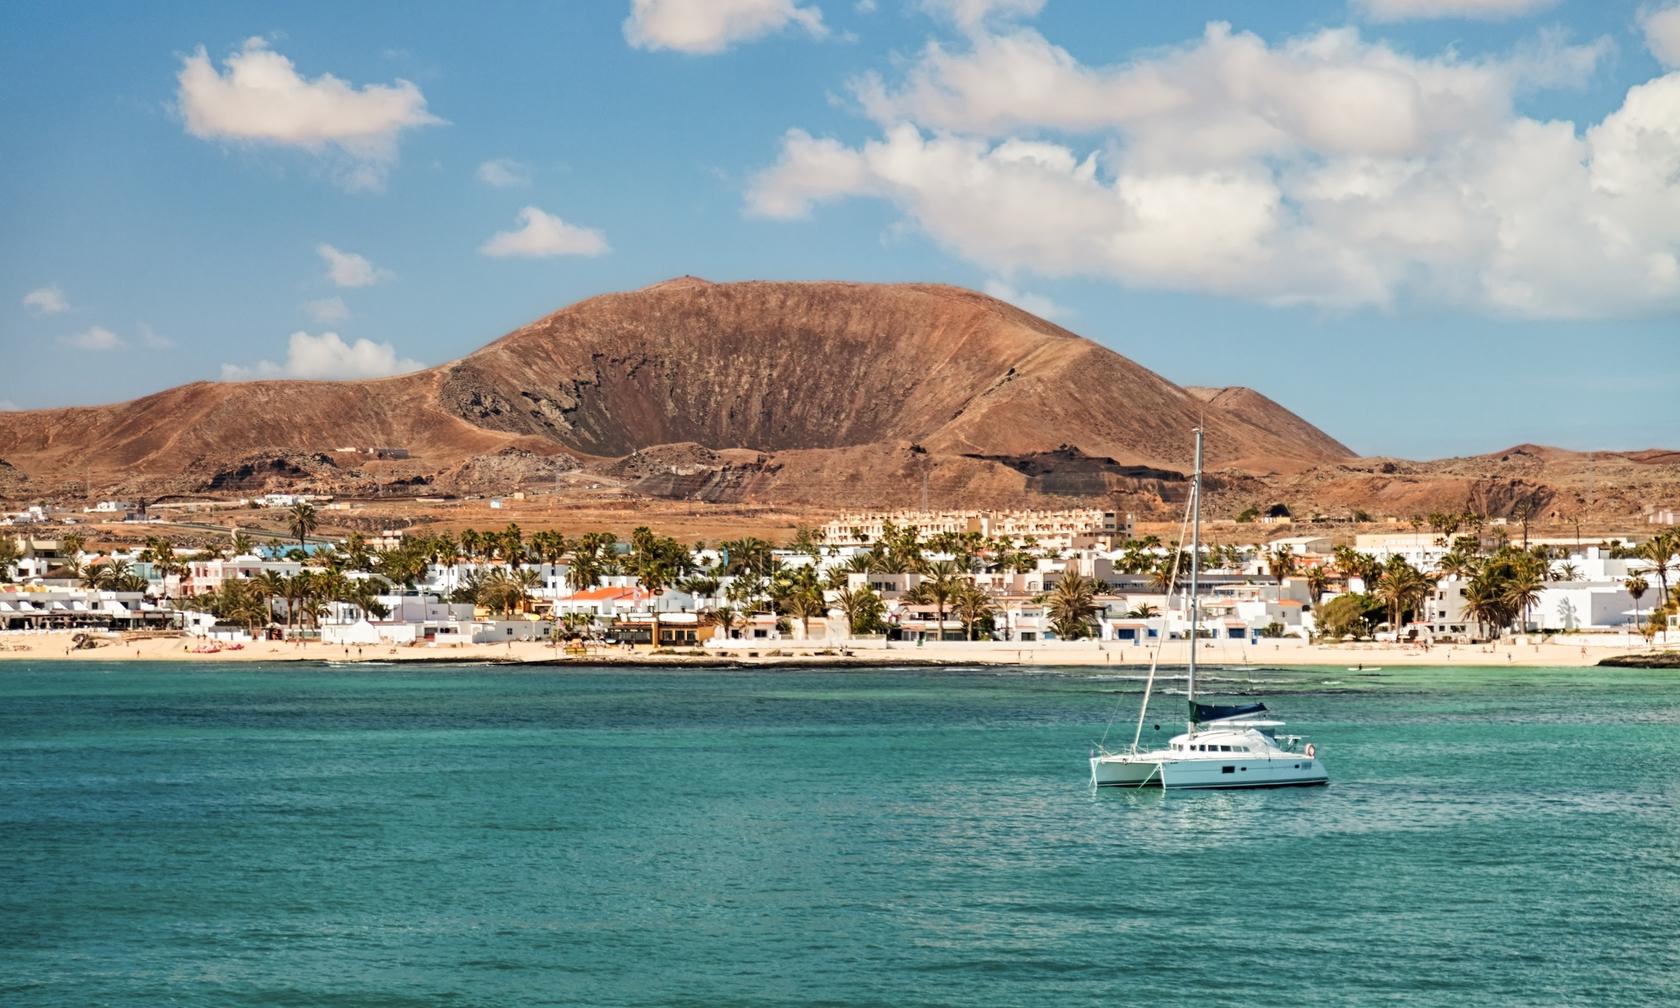 Villa and house rentals in Fuerteventura